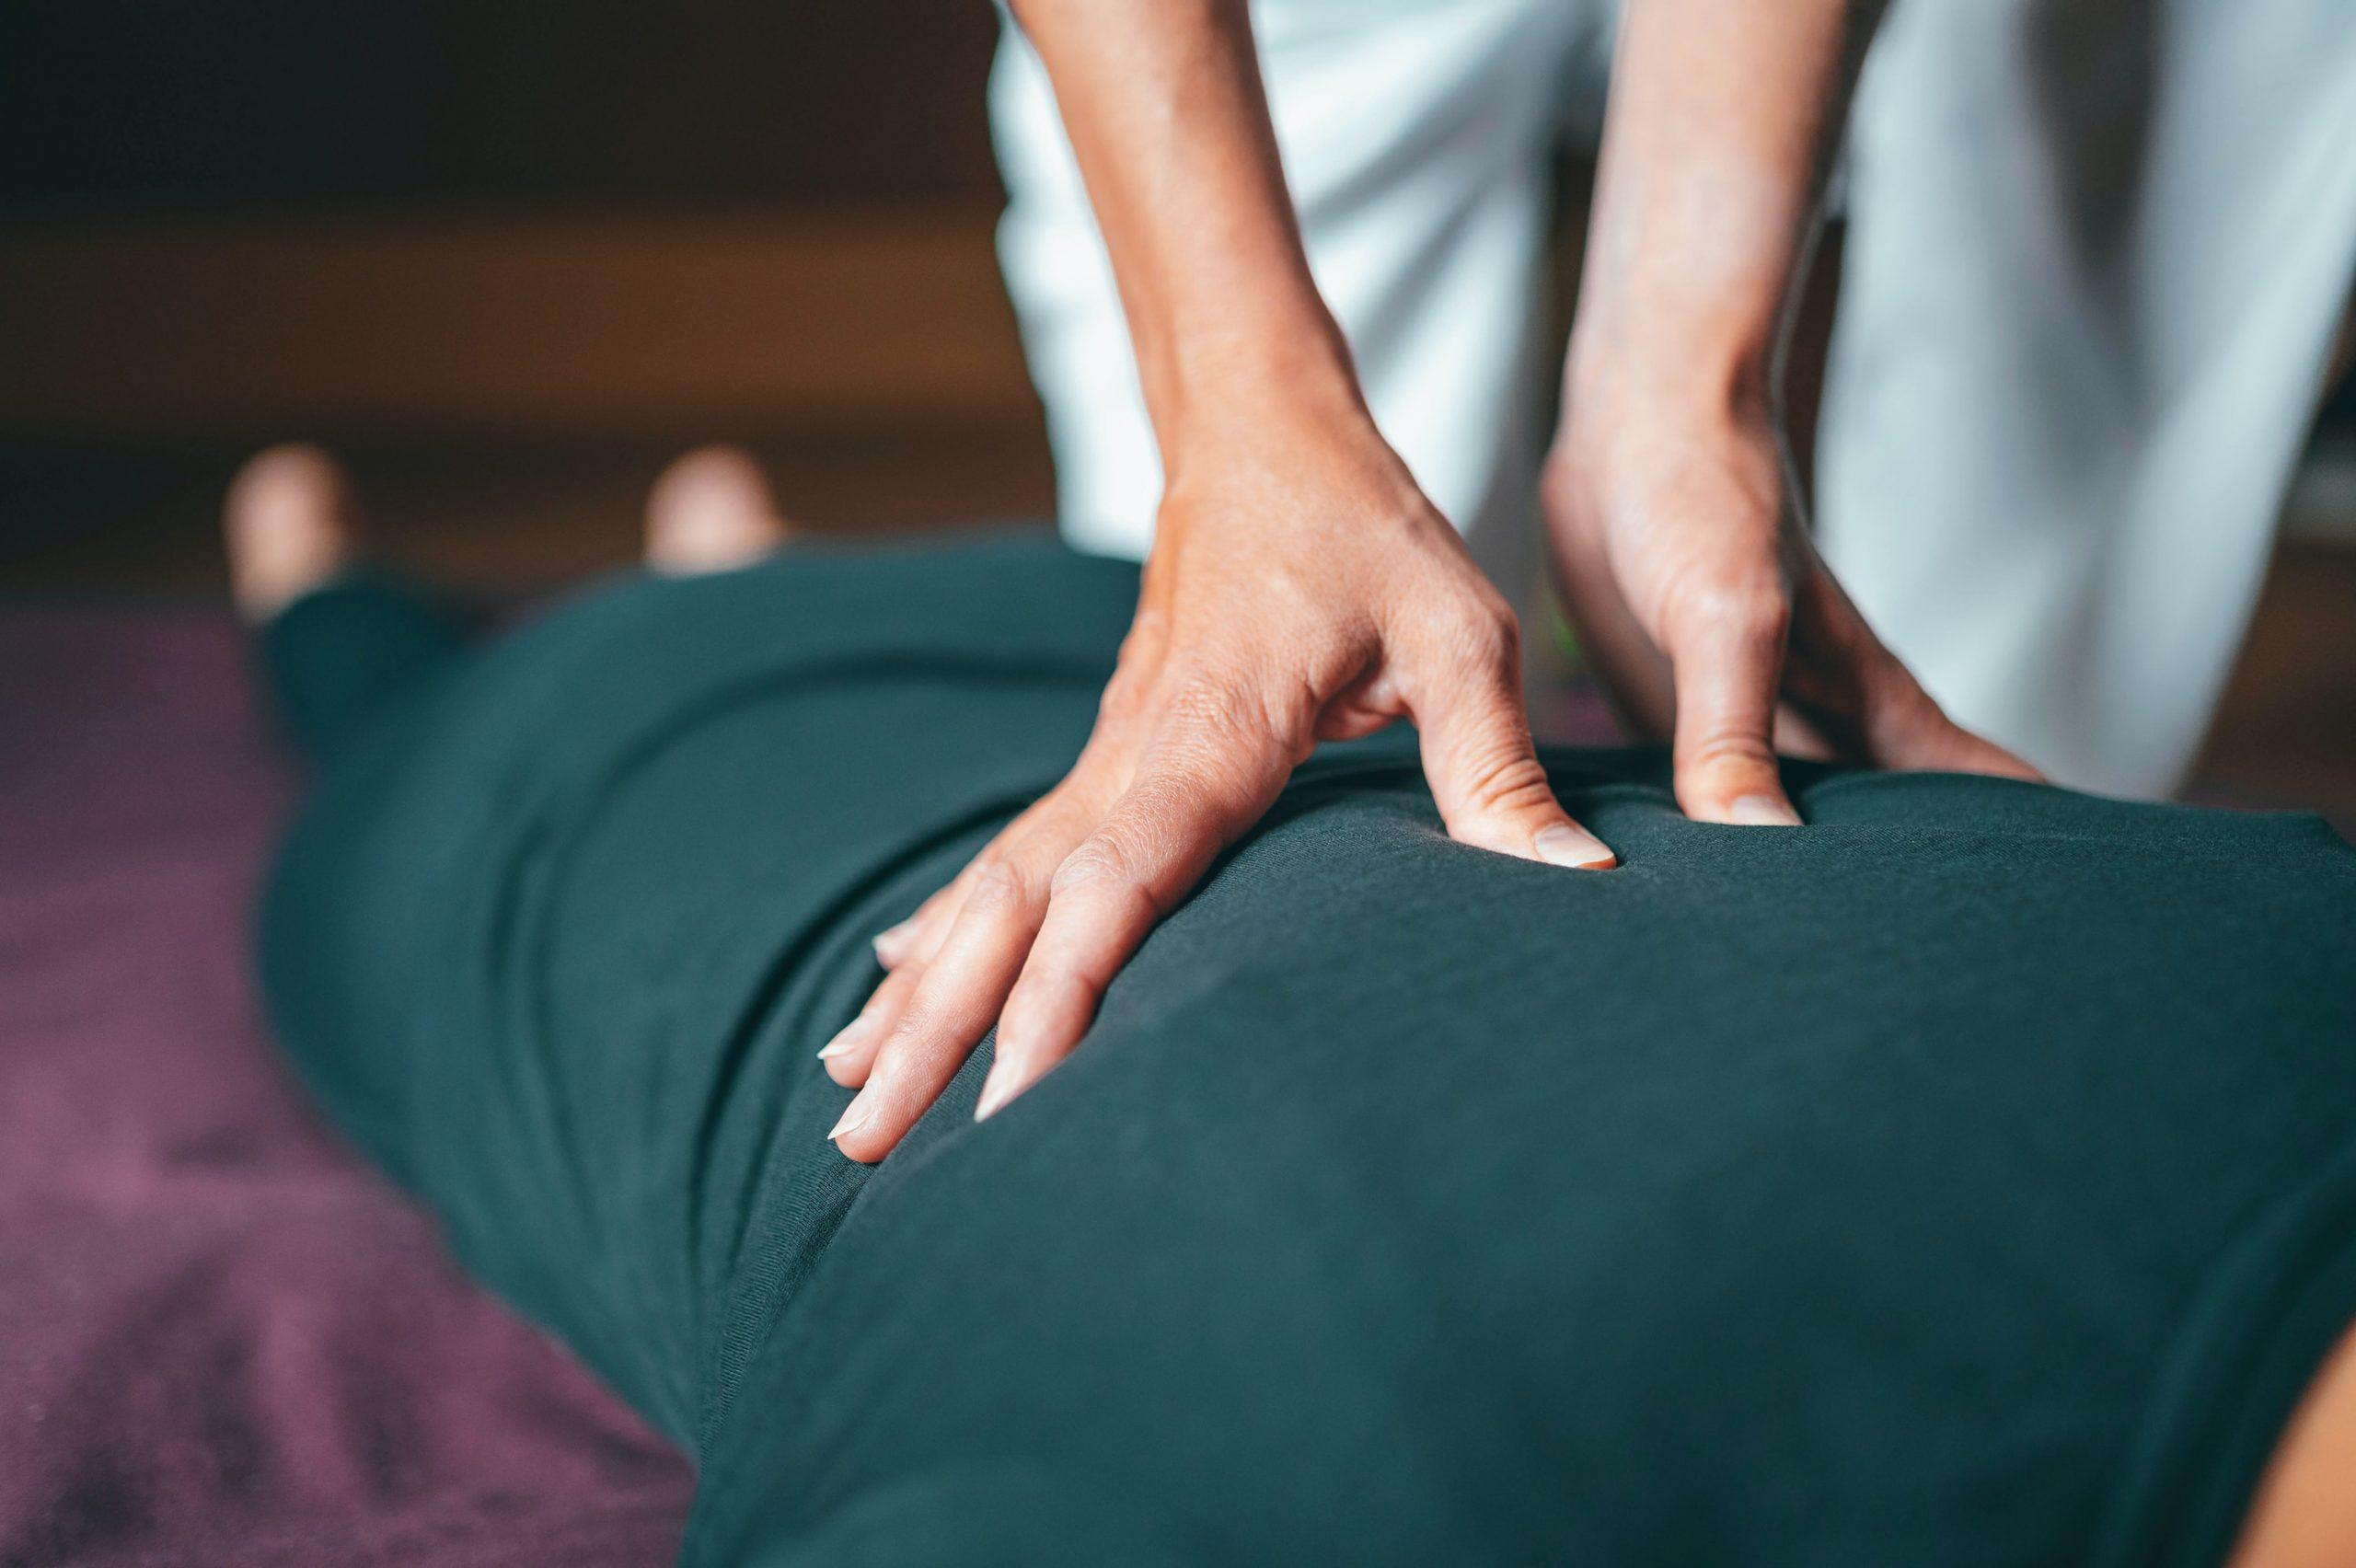 [Podcast] : Au secours, j'ai mal au dos ! (avec Marine Lirola, ostéopathe)